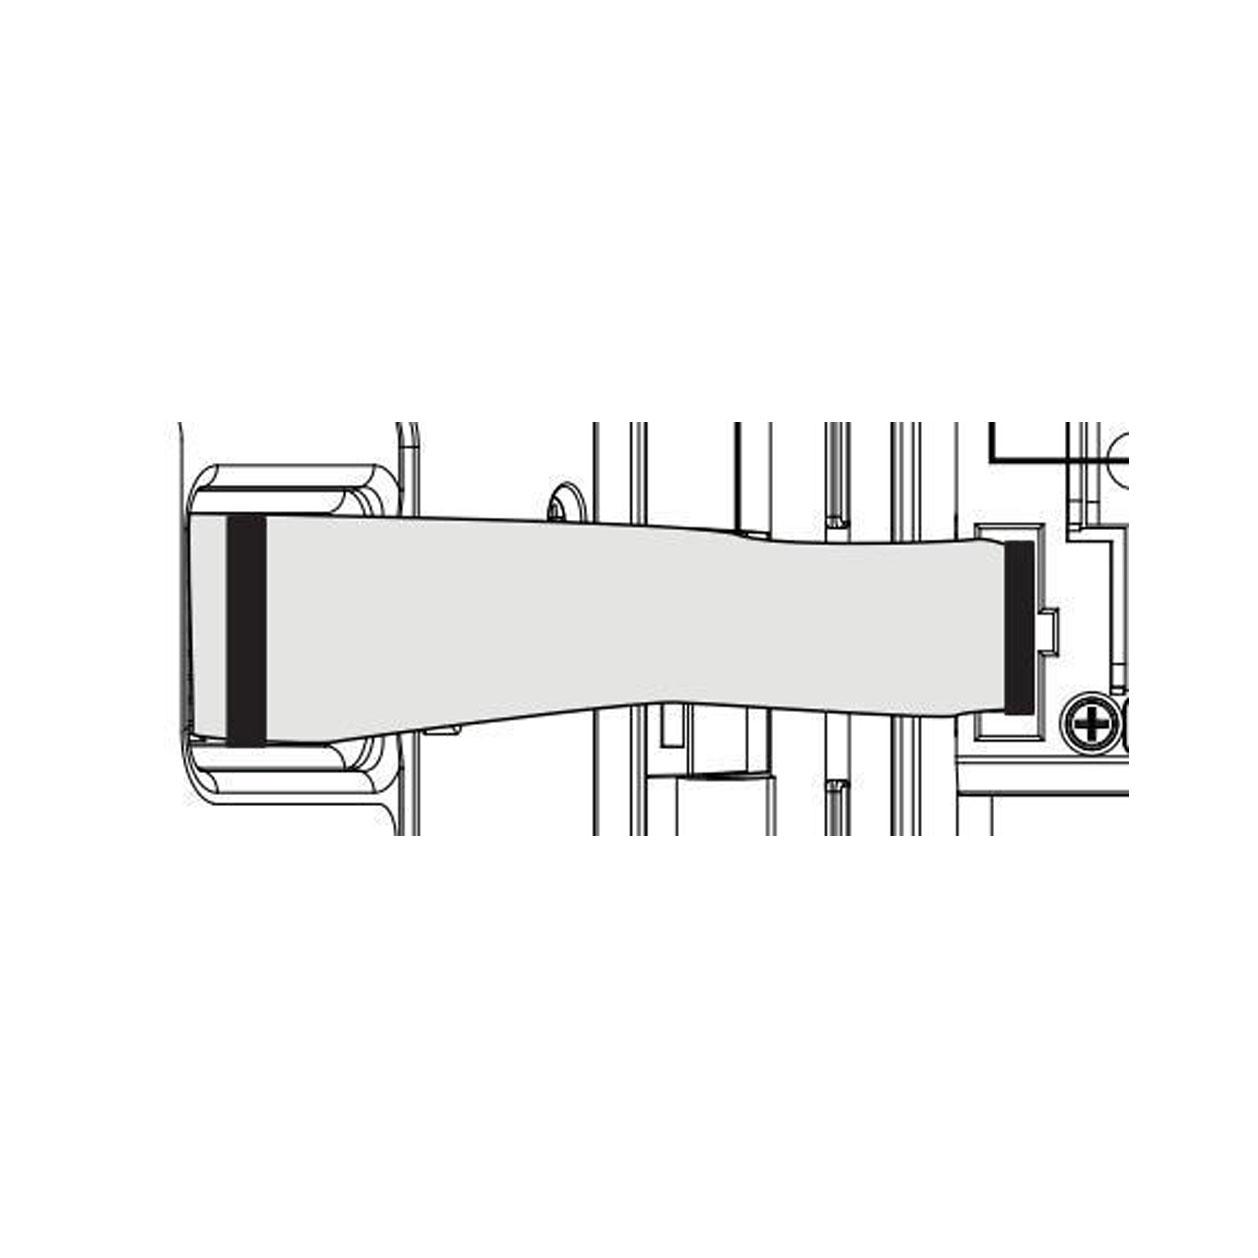 I-Core Commercial Sprinkler Controller Plastic Pedestal Ribbon Cable